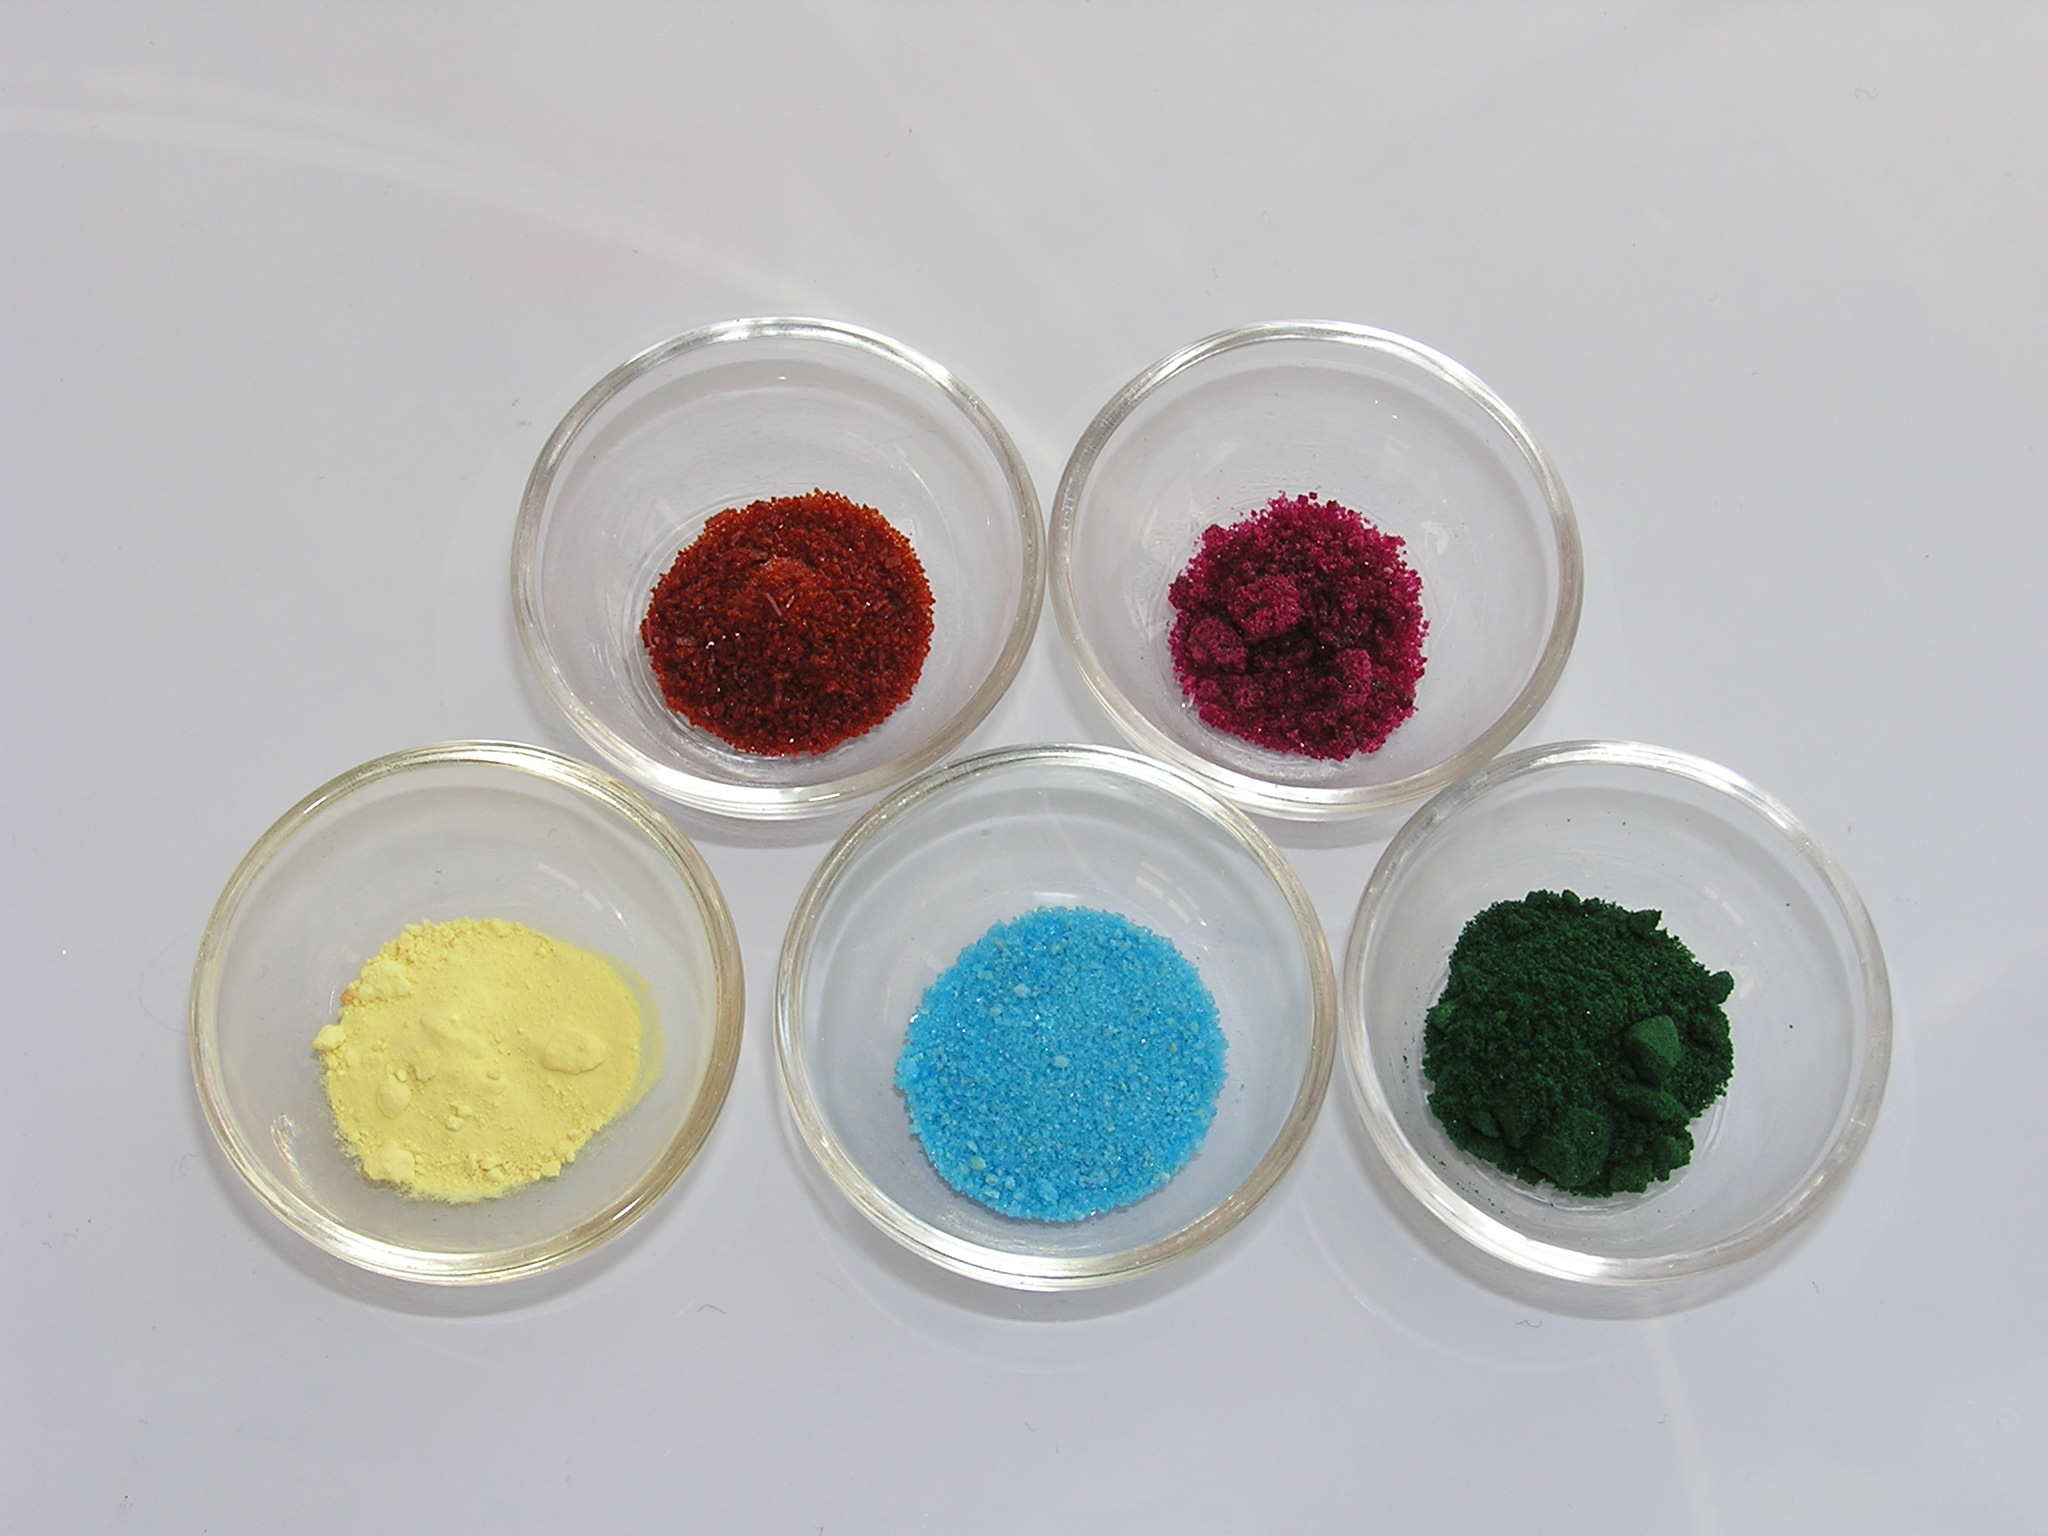 Верхний ряд (слева на право): нитропруссид натрия, хлорид кобальта; нижний ряд: сера, сульфат меди, хлорид хрома (III)